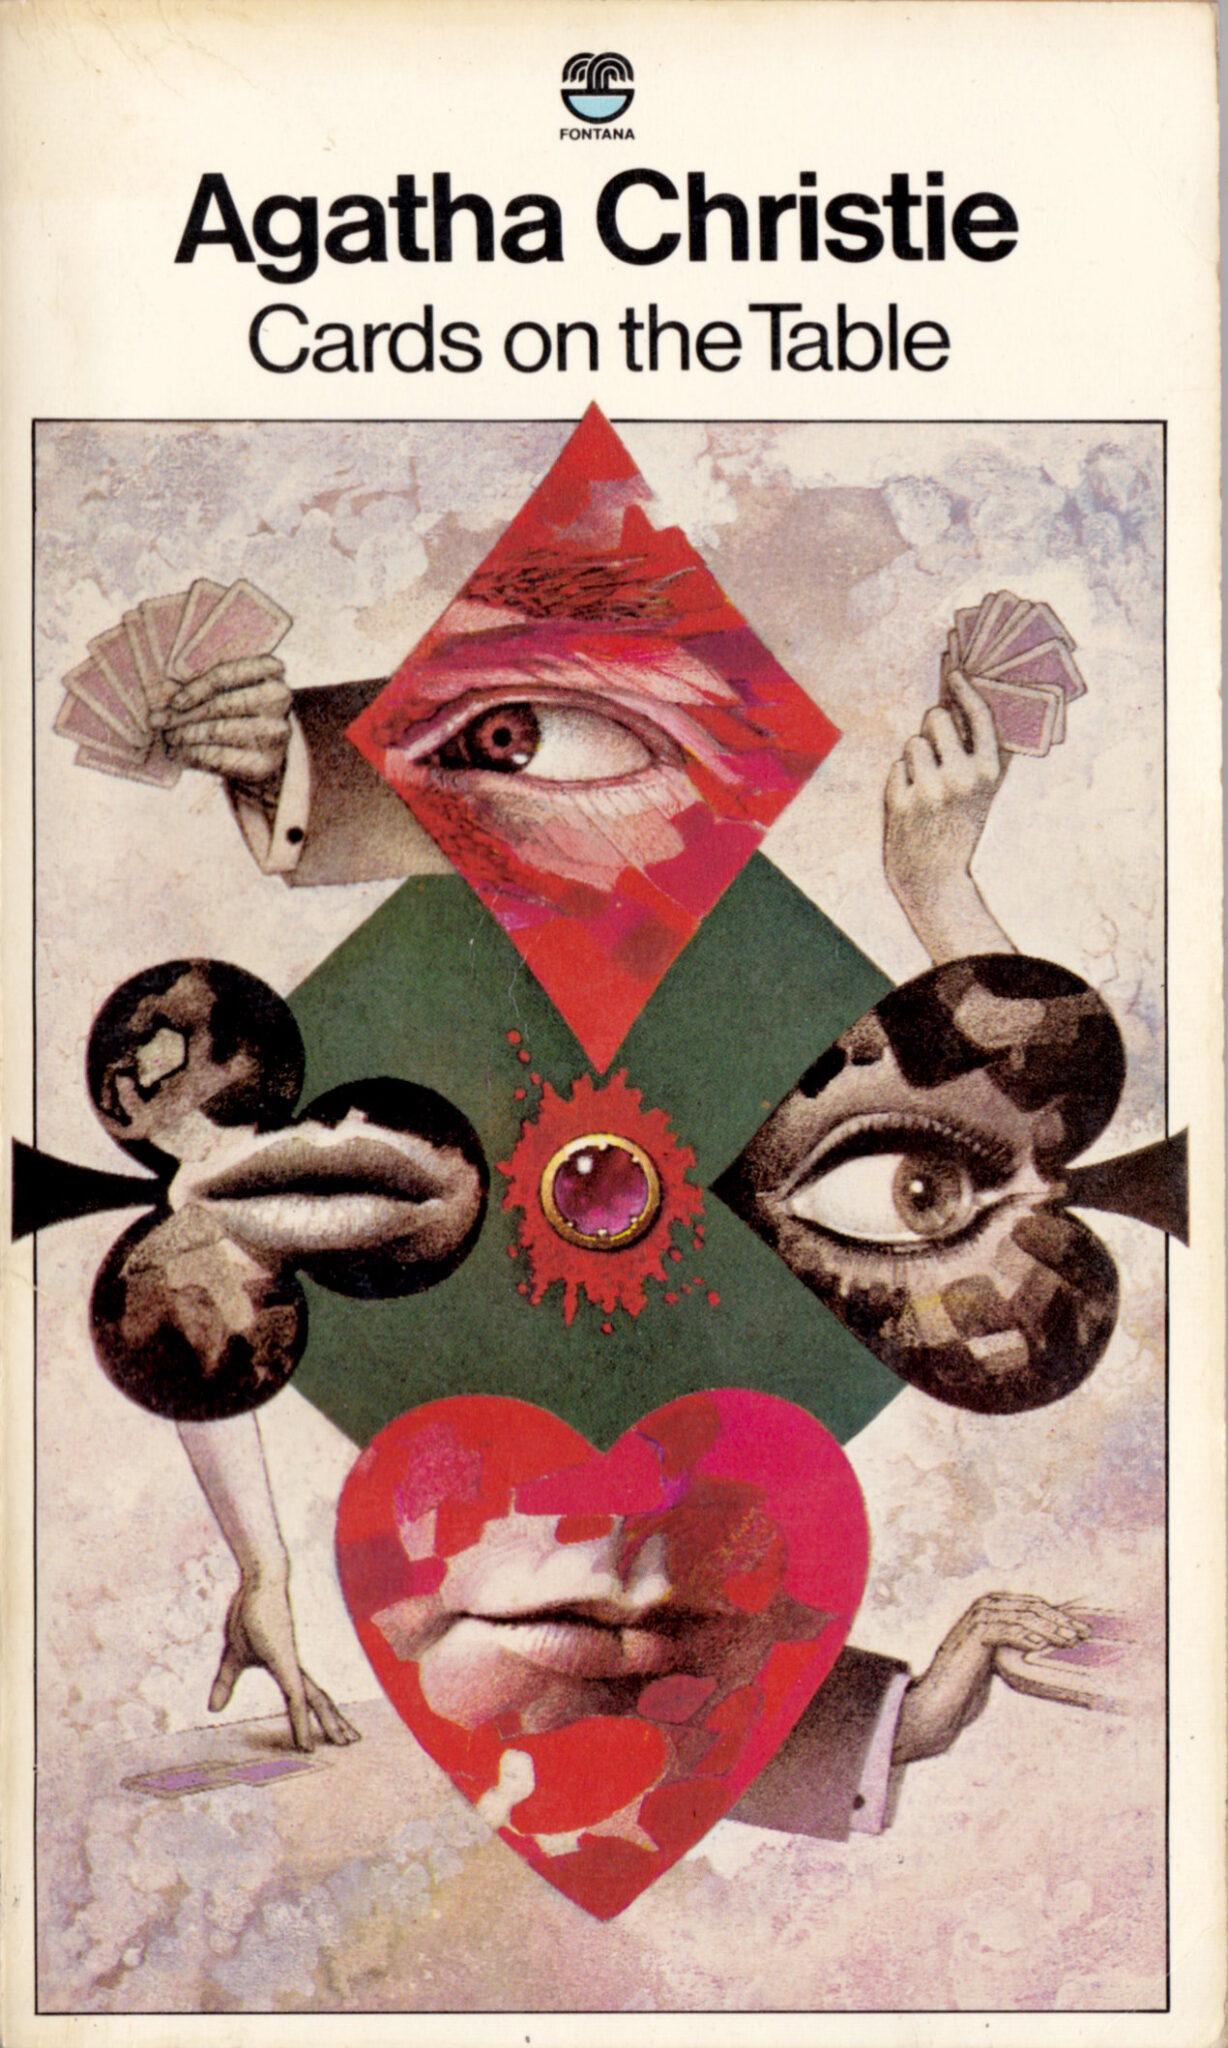 Agatha Christie Tom Adams Cards on the Tables Fontana UK 1976